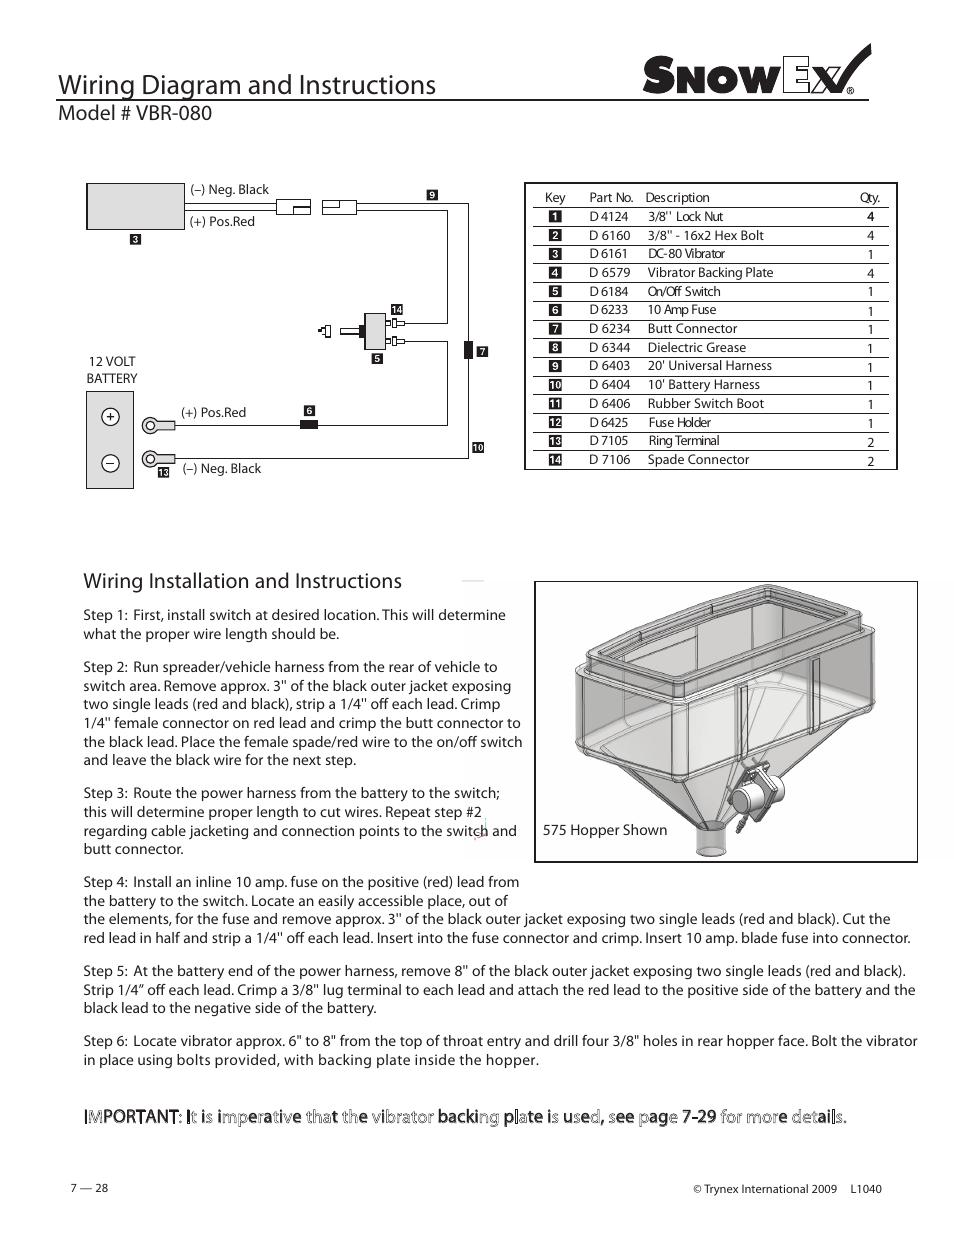 hight resolution of wiring diagram and instructions model vbr 080 wiring snowex wiring diagram 2500